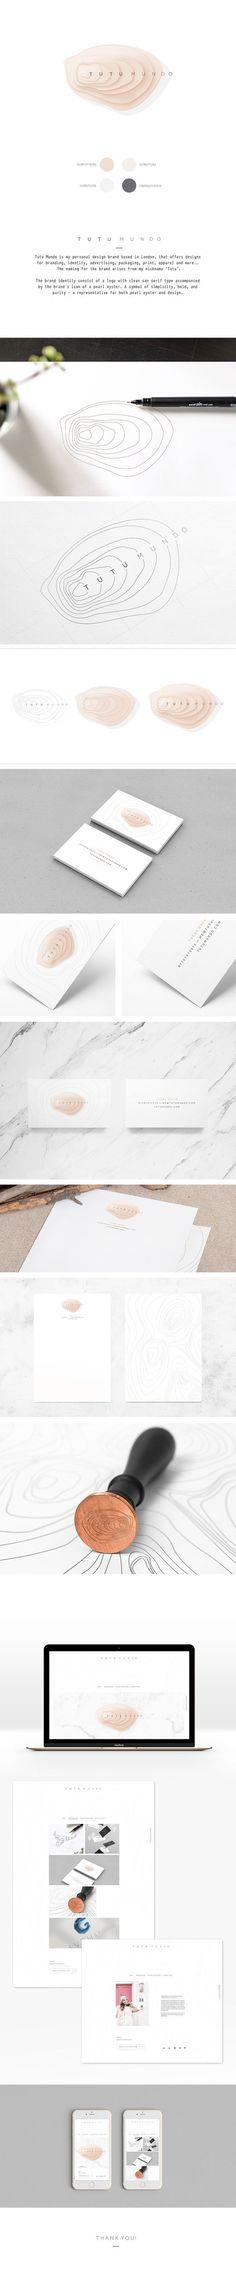 Fivestar Branding - Design and Branding Agency & Inspiration Gallery